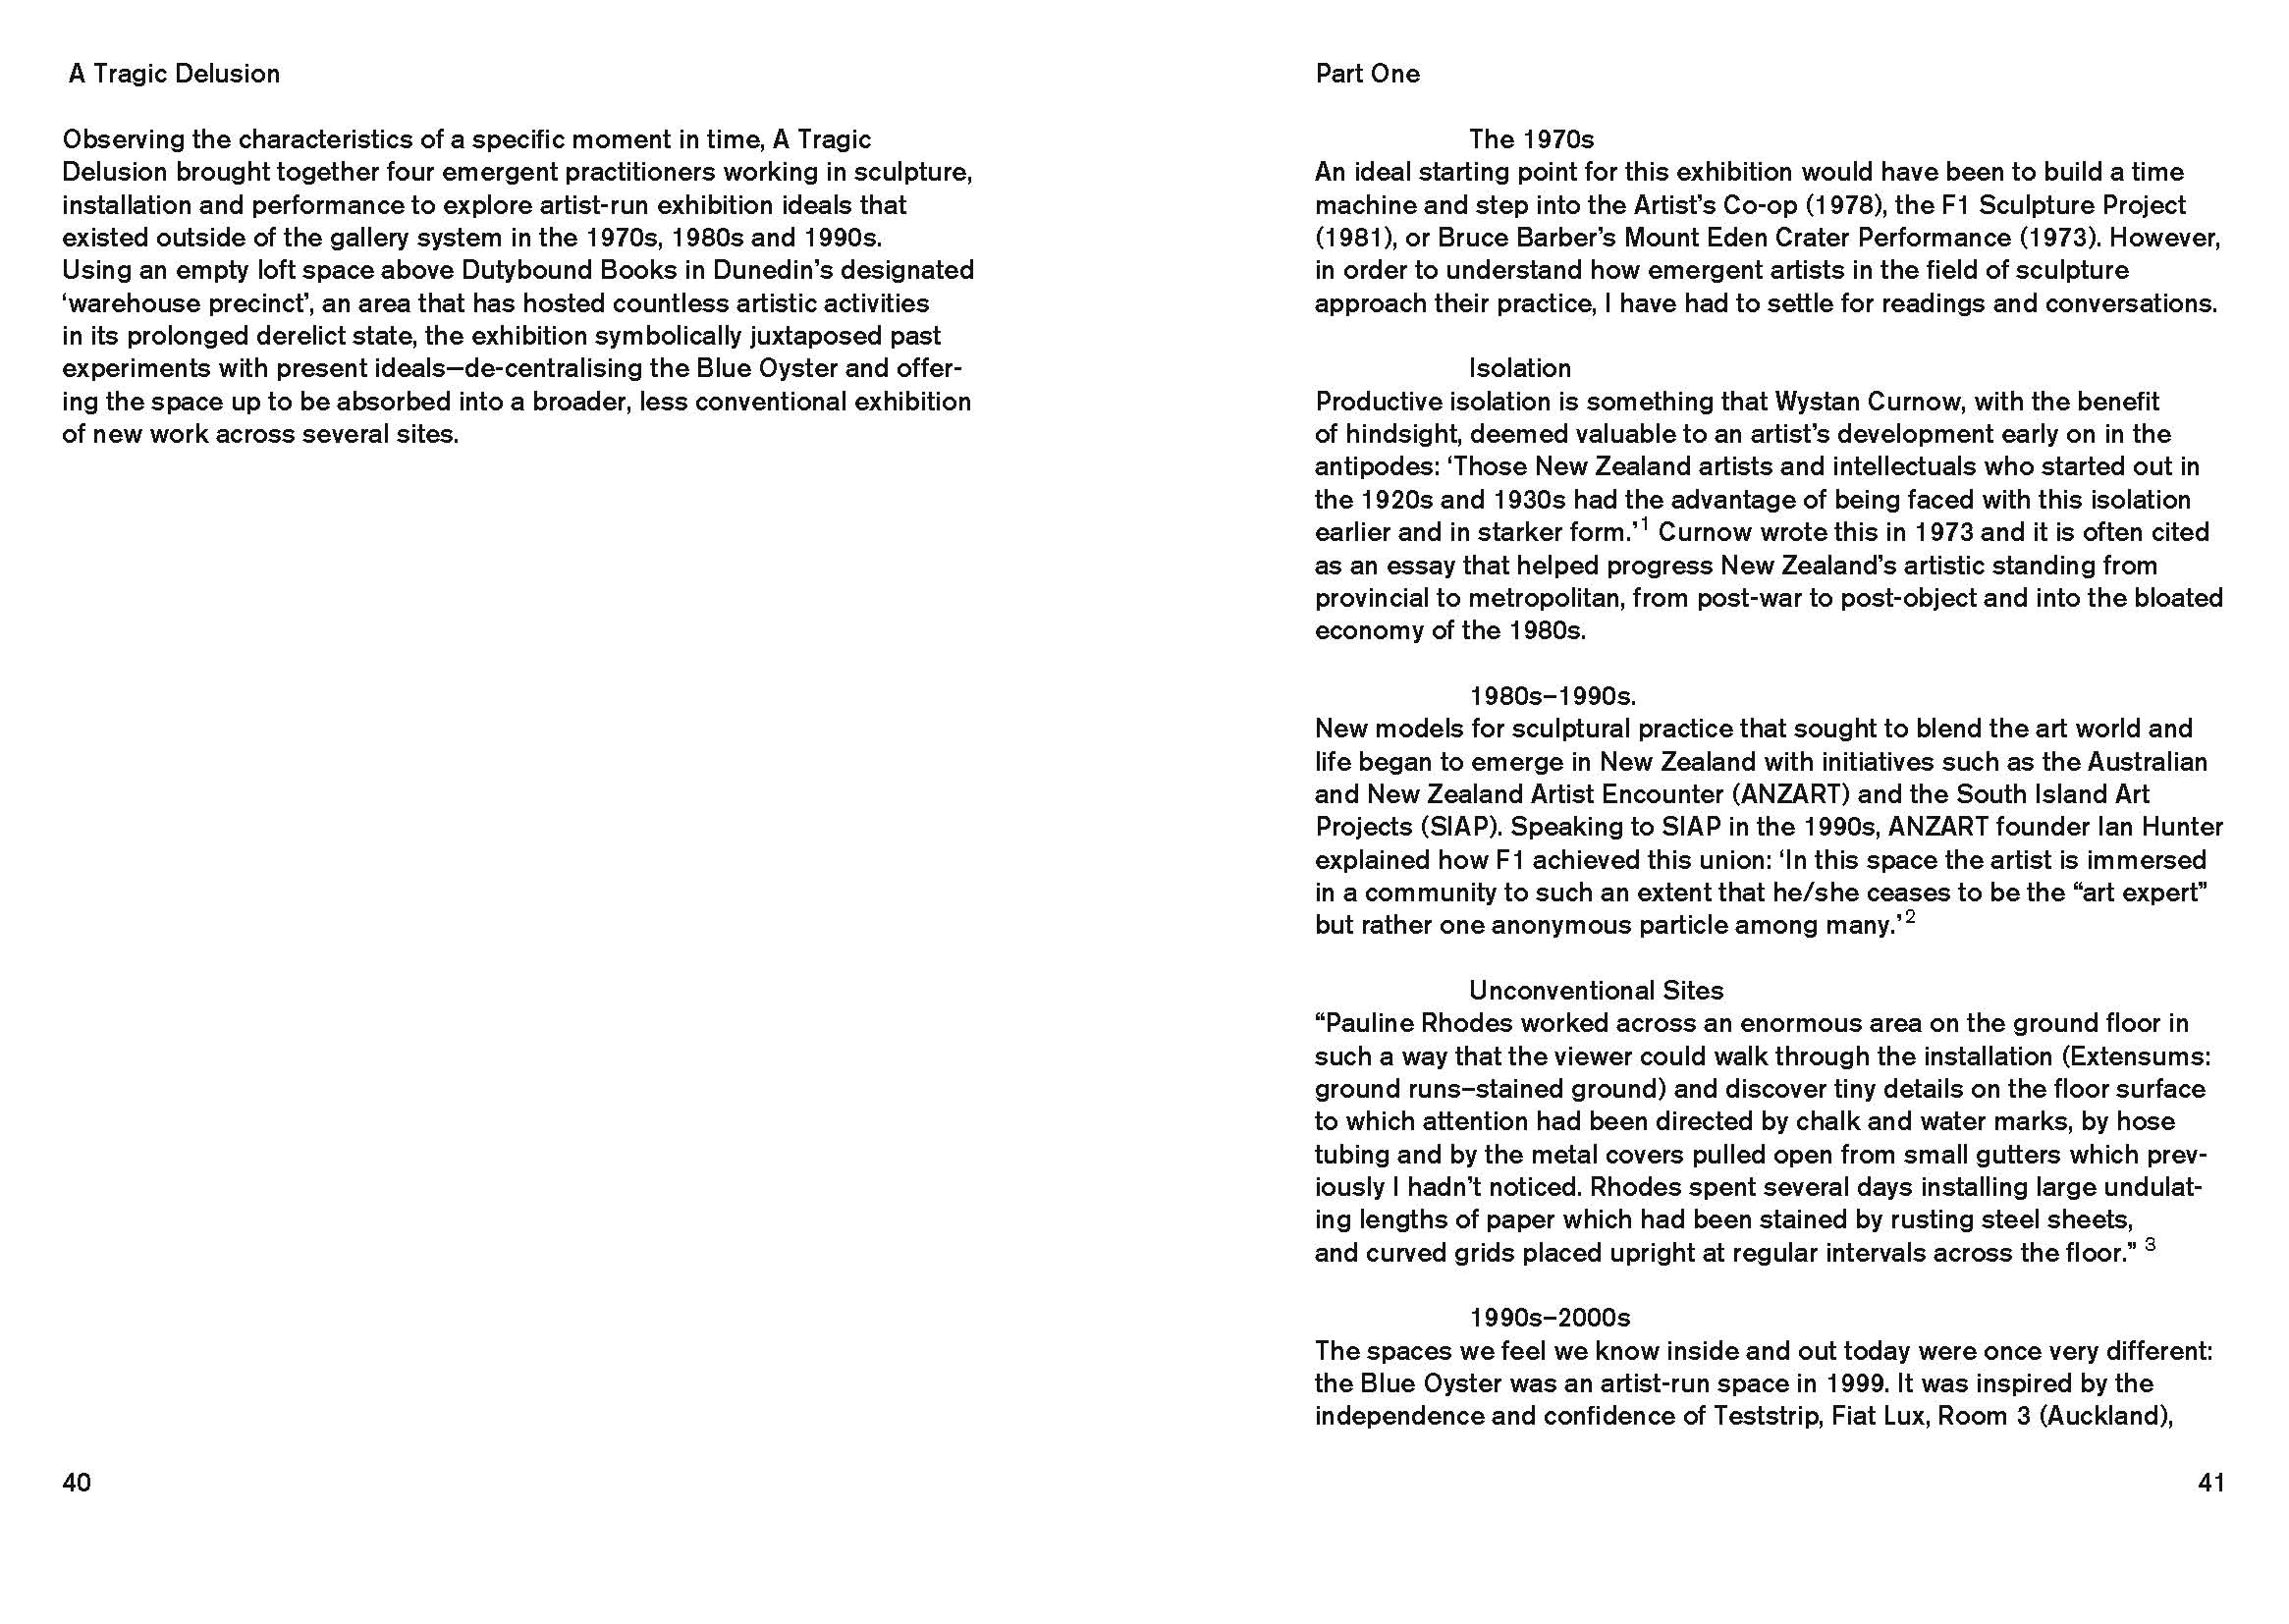 A Tragic Delusion Exhibition Essay_Page_1.jpg